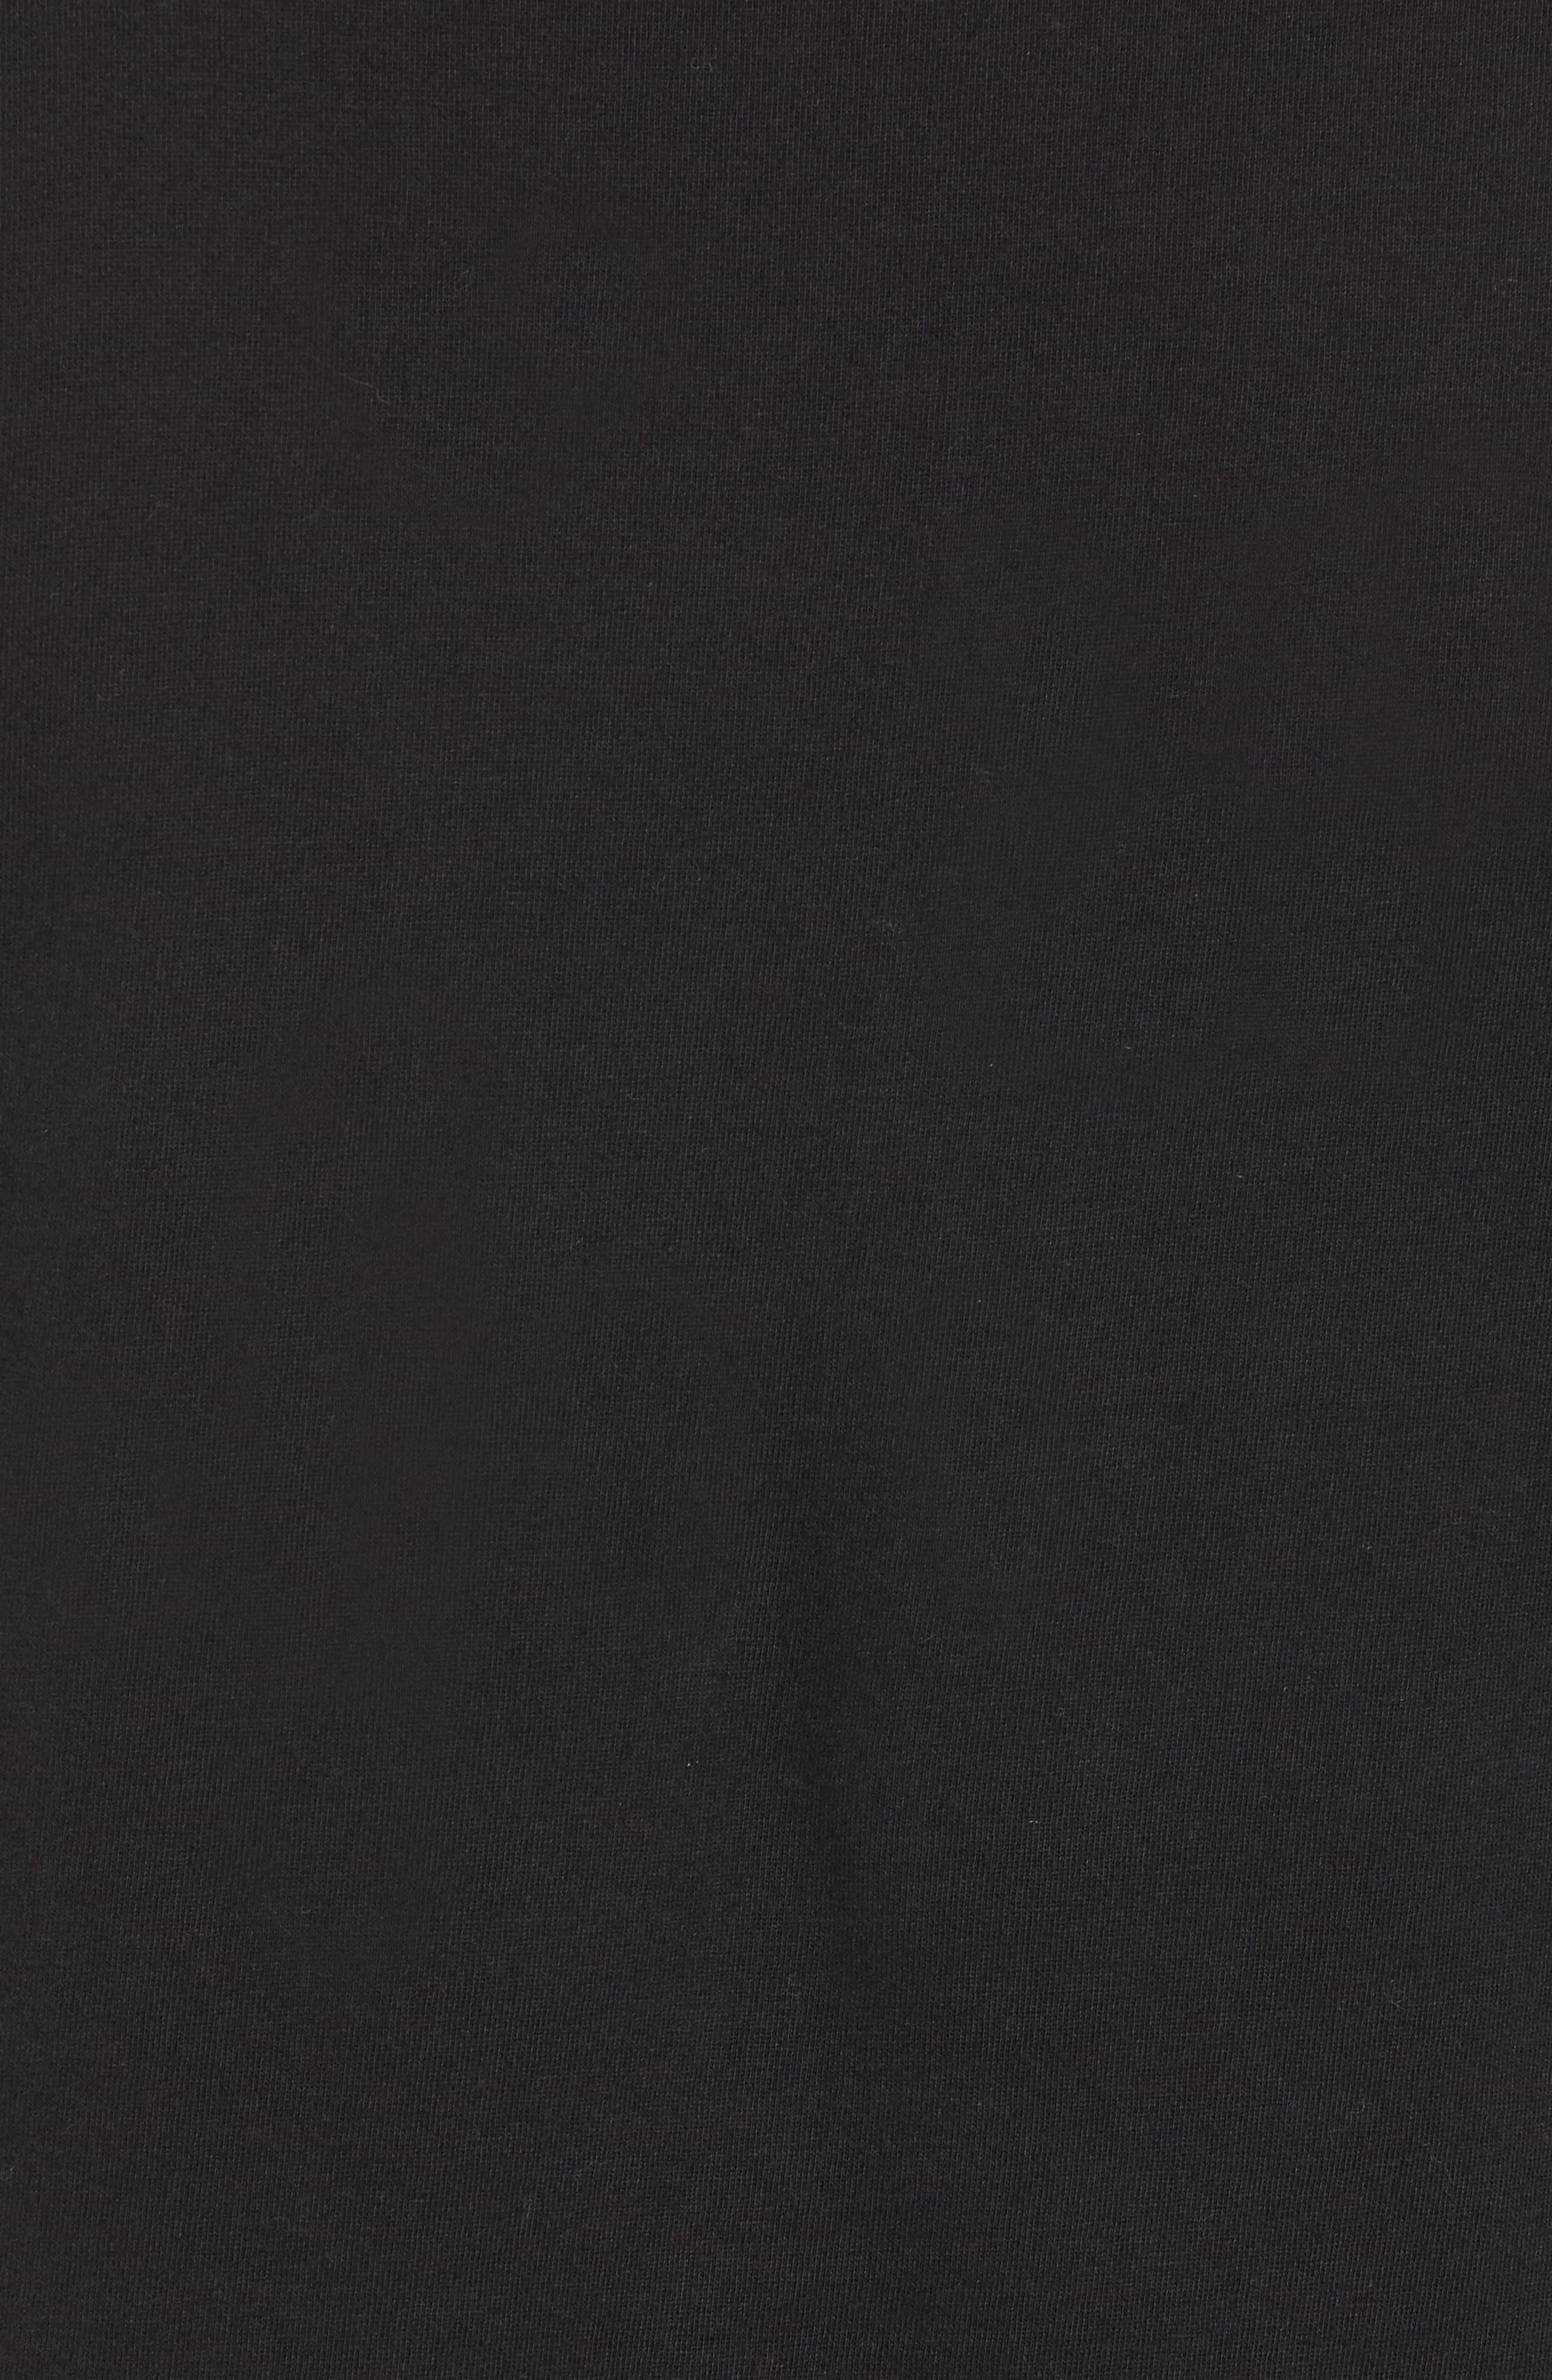 Love Struck T-Shirt,                             Alternate thumbnail 5, color,                             BLACK CALLUNA YELLOW WHITE